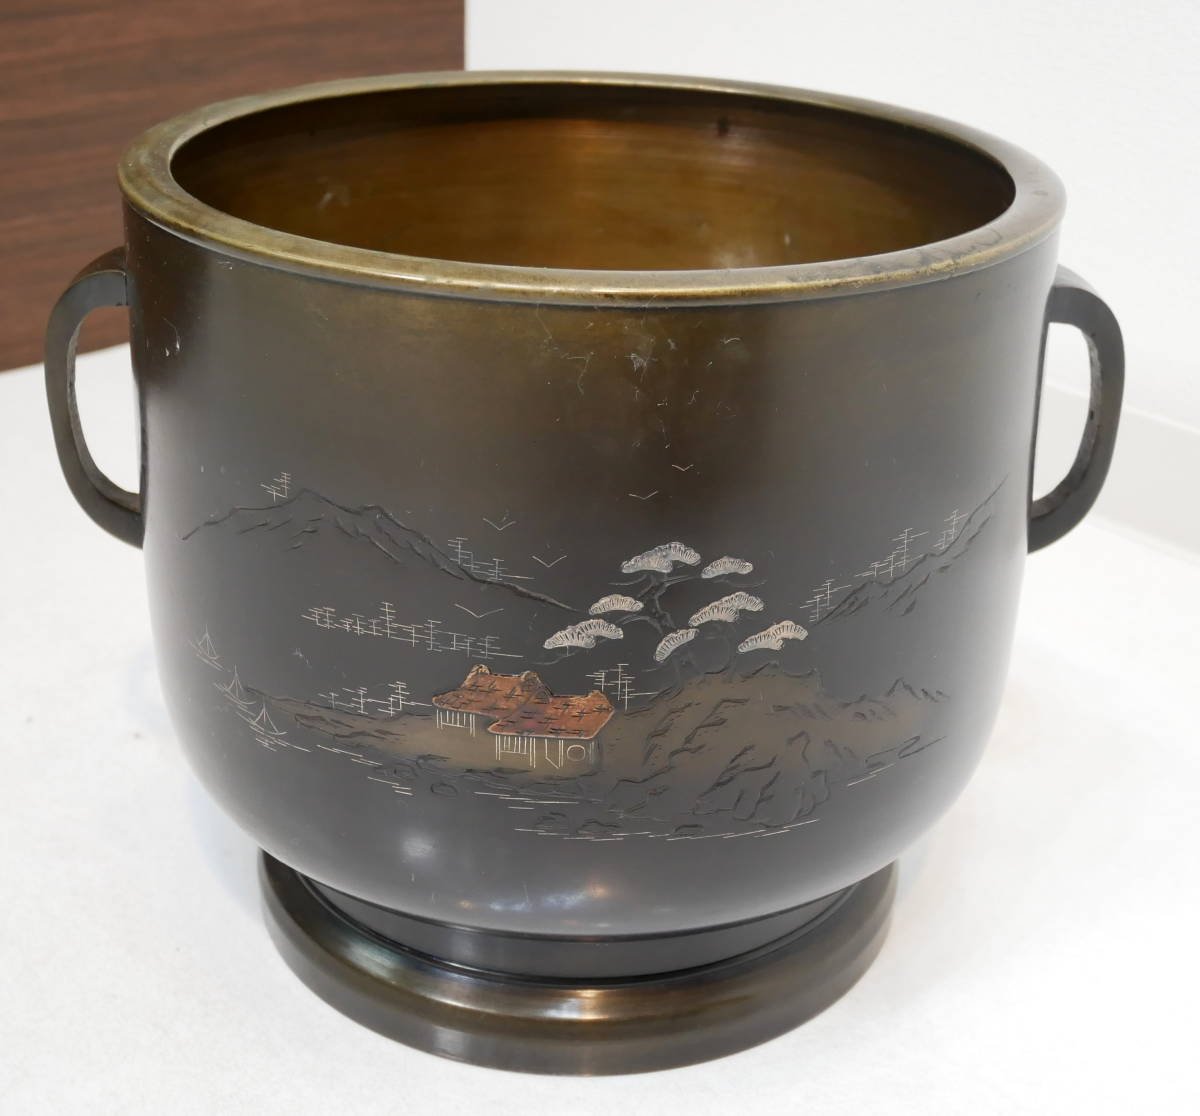 ▲(R205-B121)時代物 銅火鉢 真鍮 黄銅 共箱付き 直径26cm 高さ24cm 火ばち 置物 アンティーク 灰付_画像2